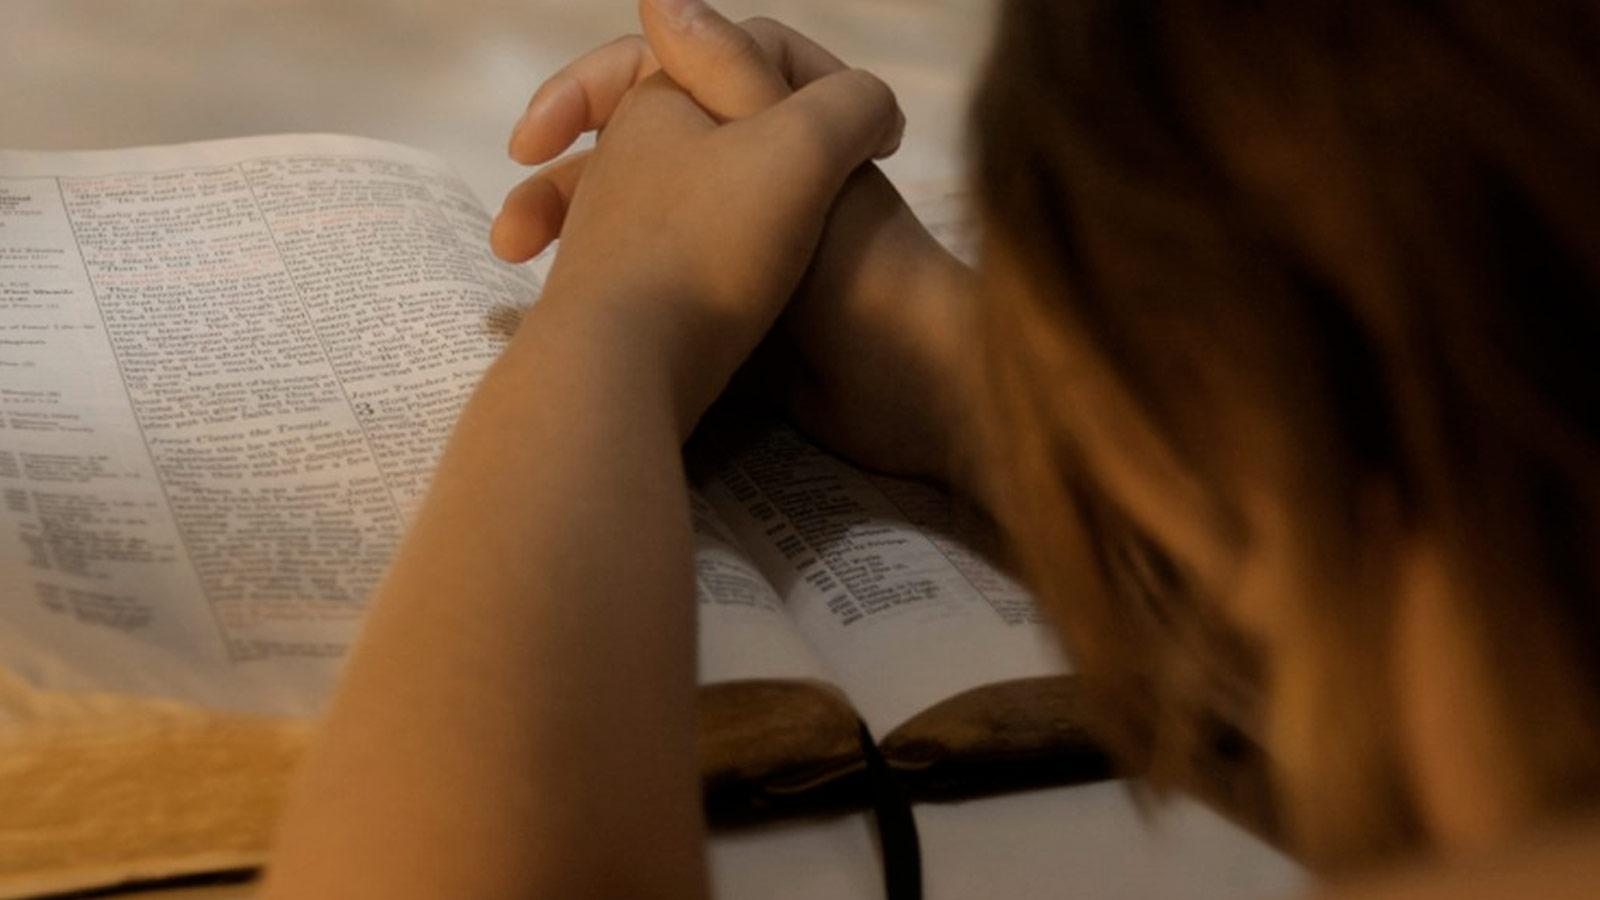 mujer-orando-biblia